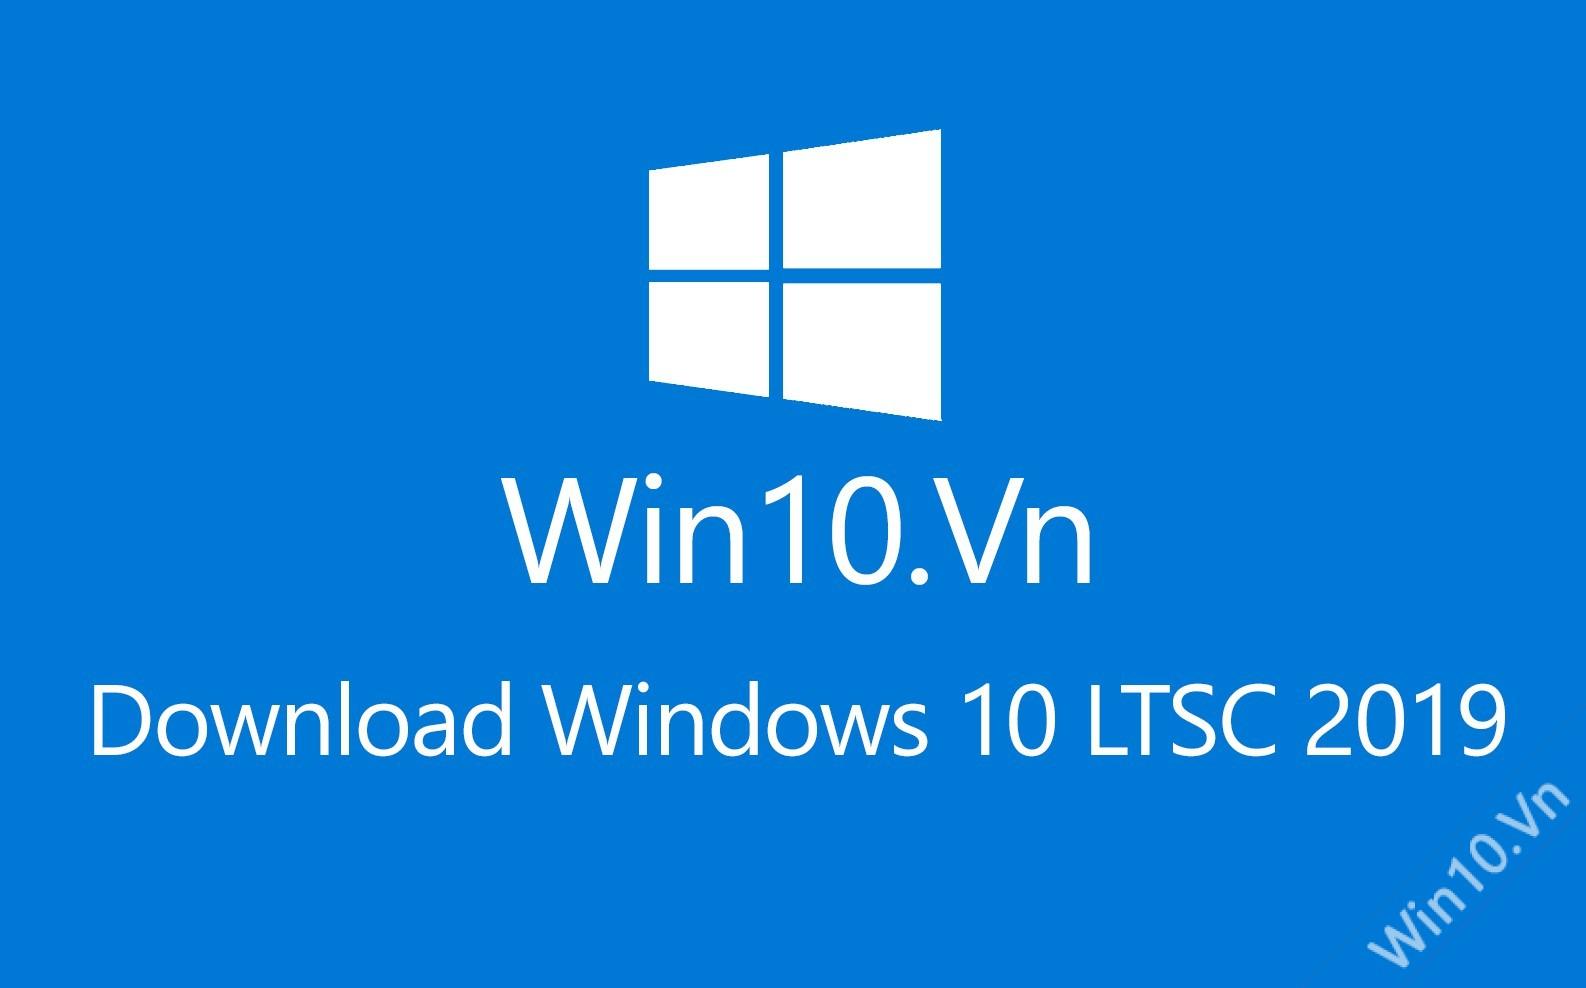 Download Windows 10 LTSC 2019